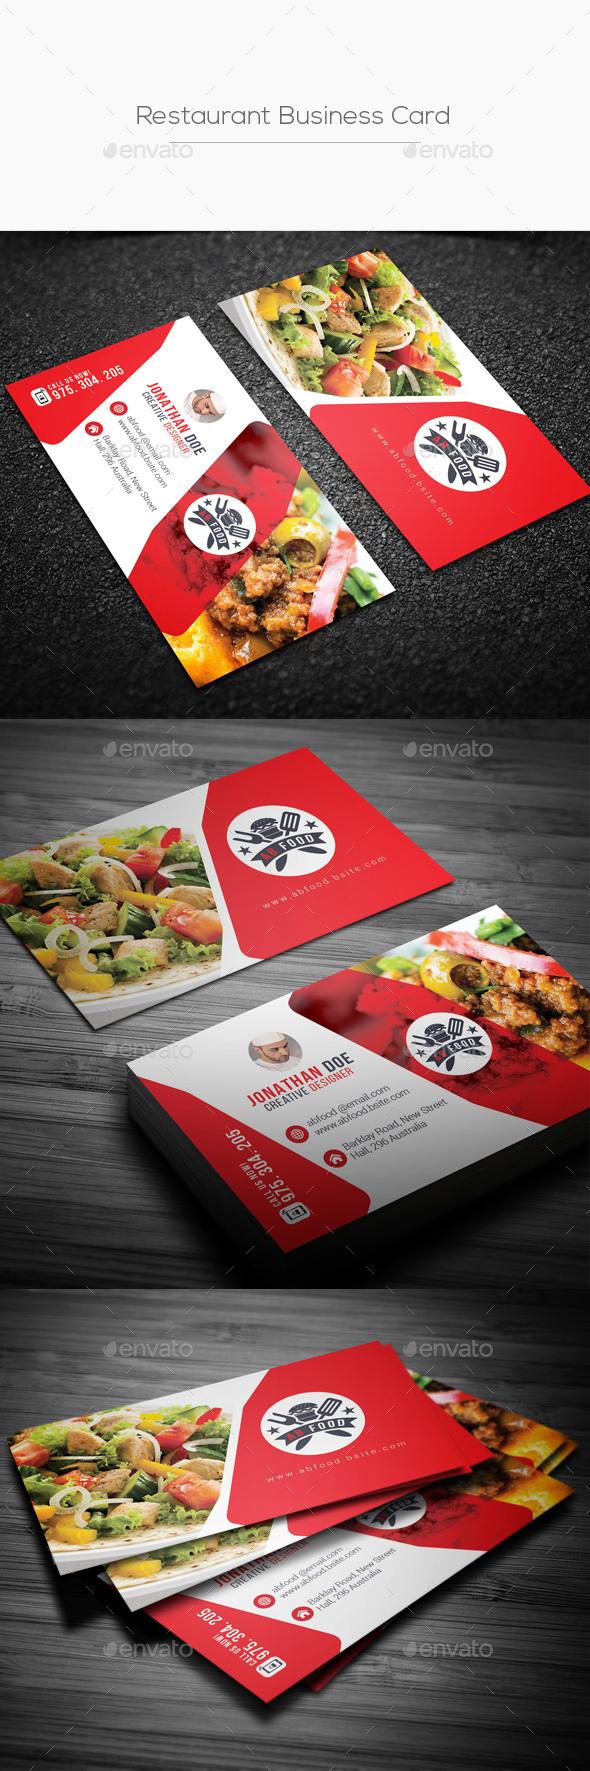 GraphicRiver Restaurant Business Card 20824578